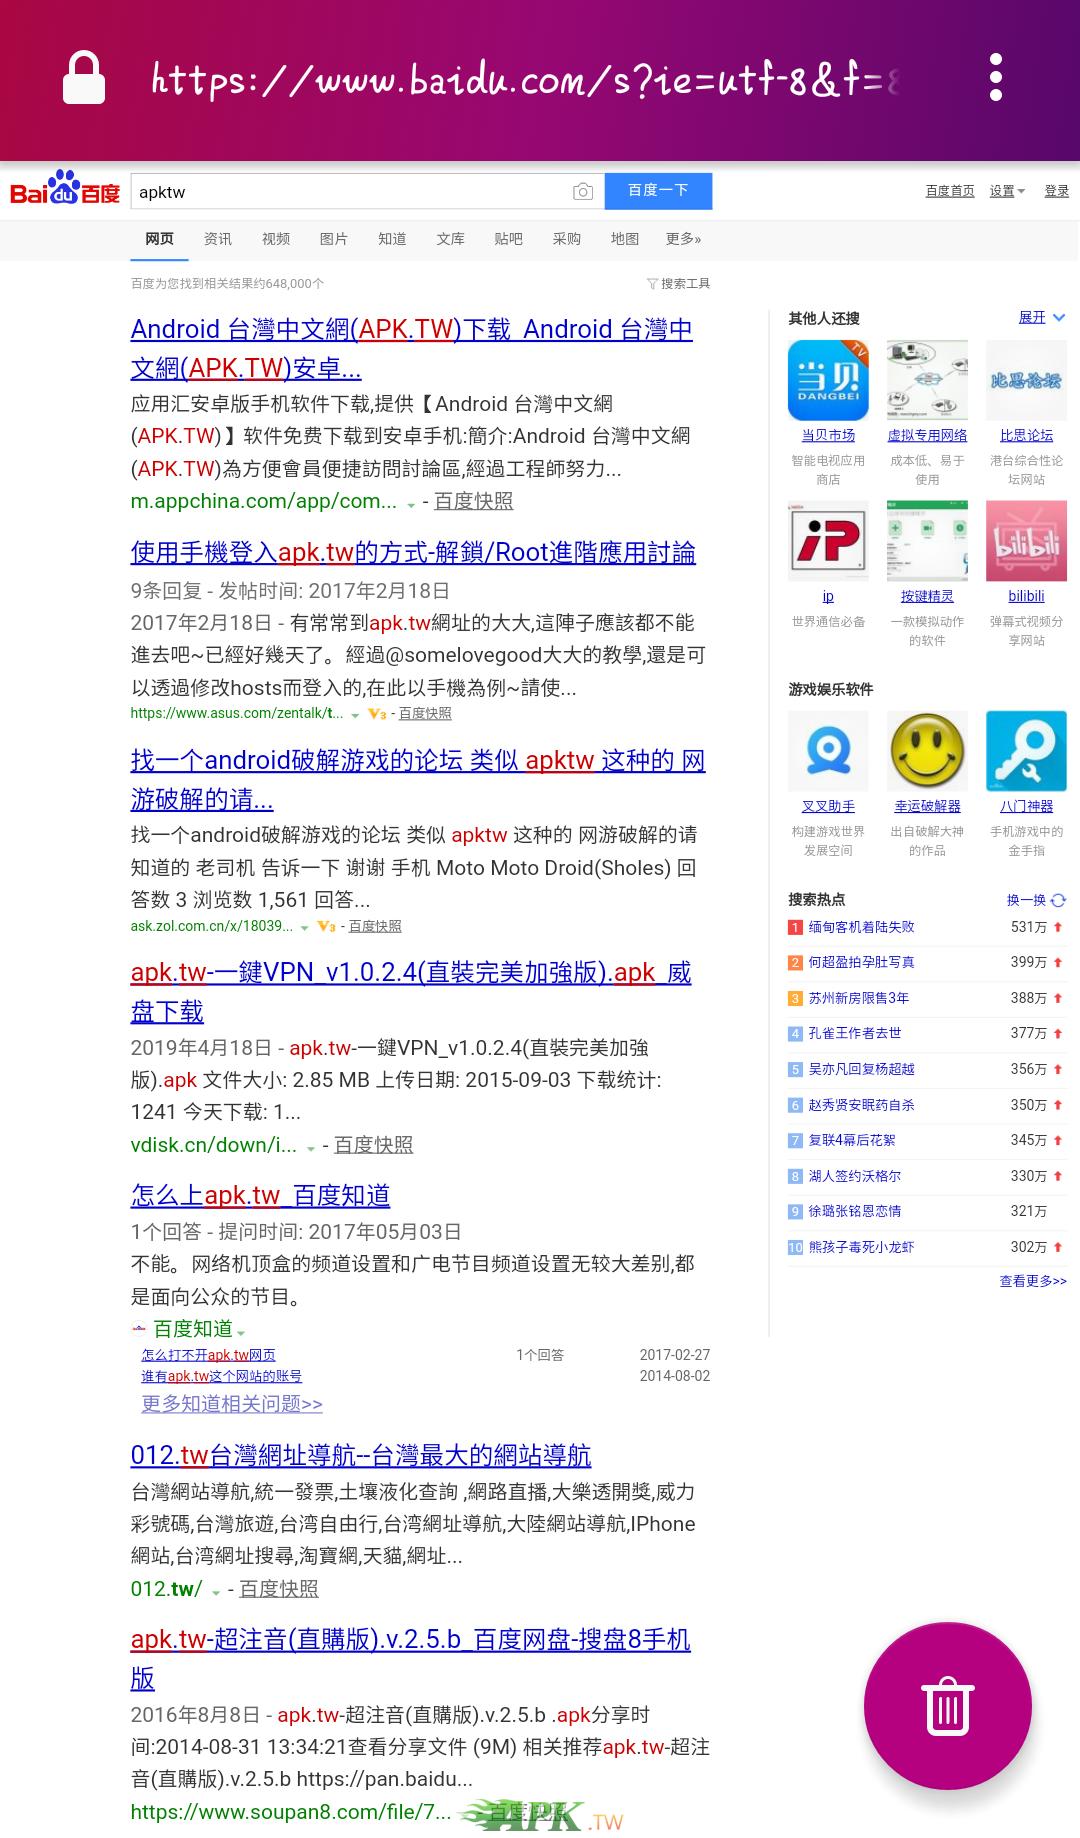 Screenshot_2019-05-13-06-55-32-1.png